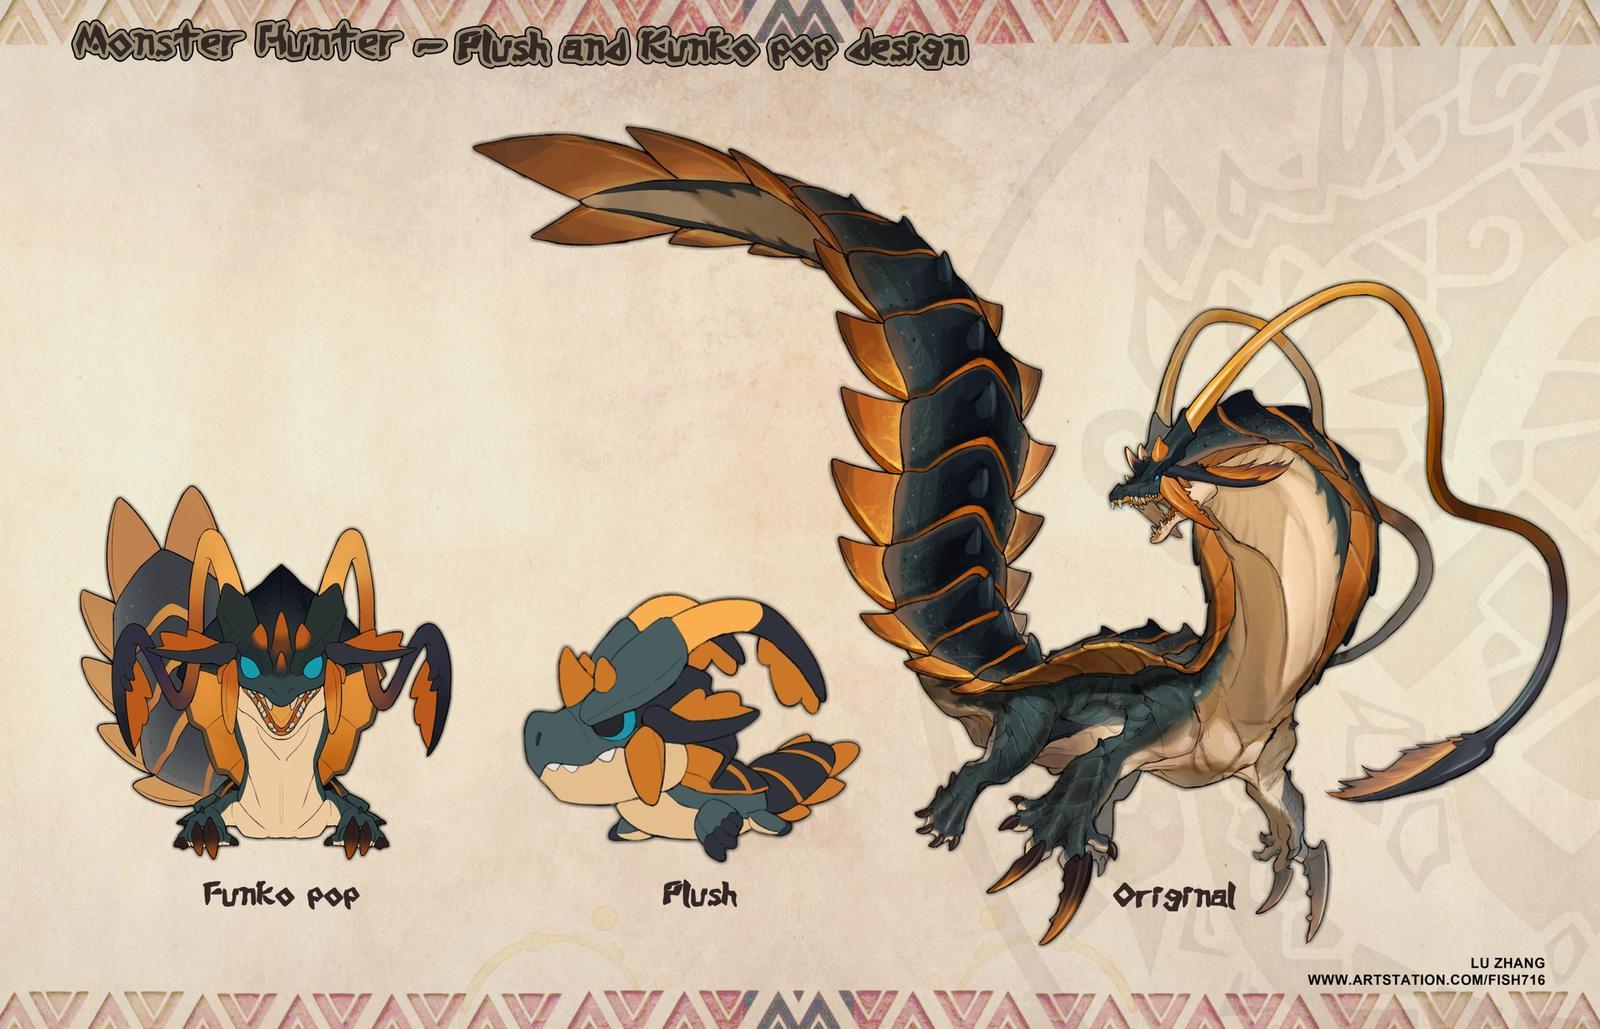 Monster Hunter - Plush & FunkoPop